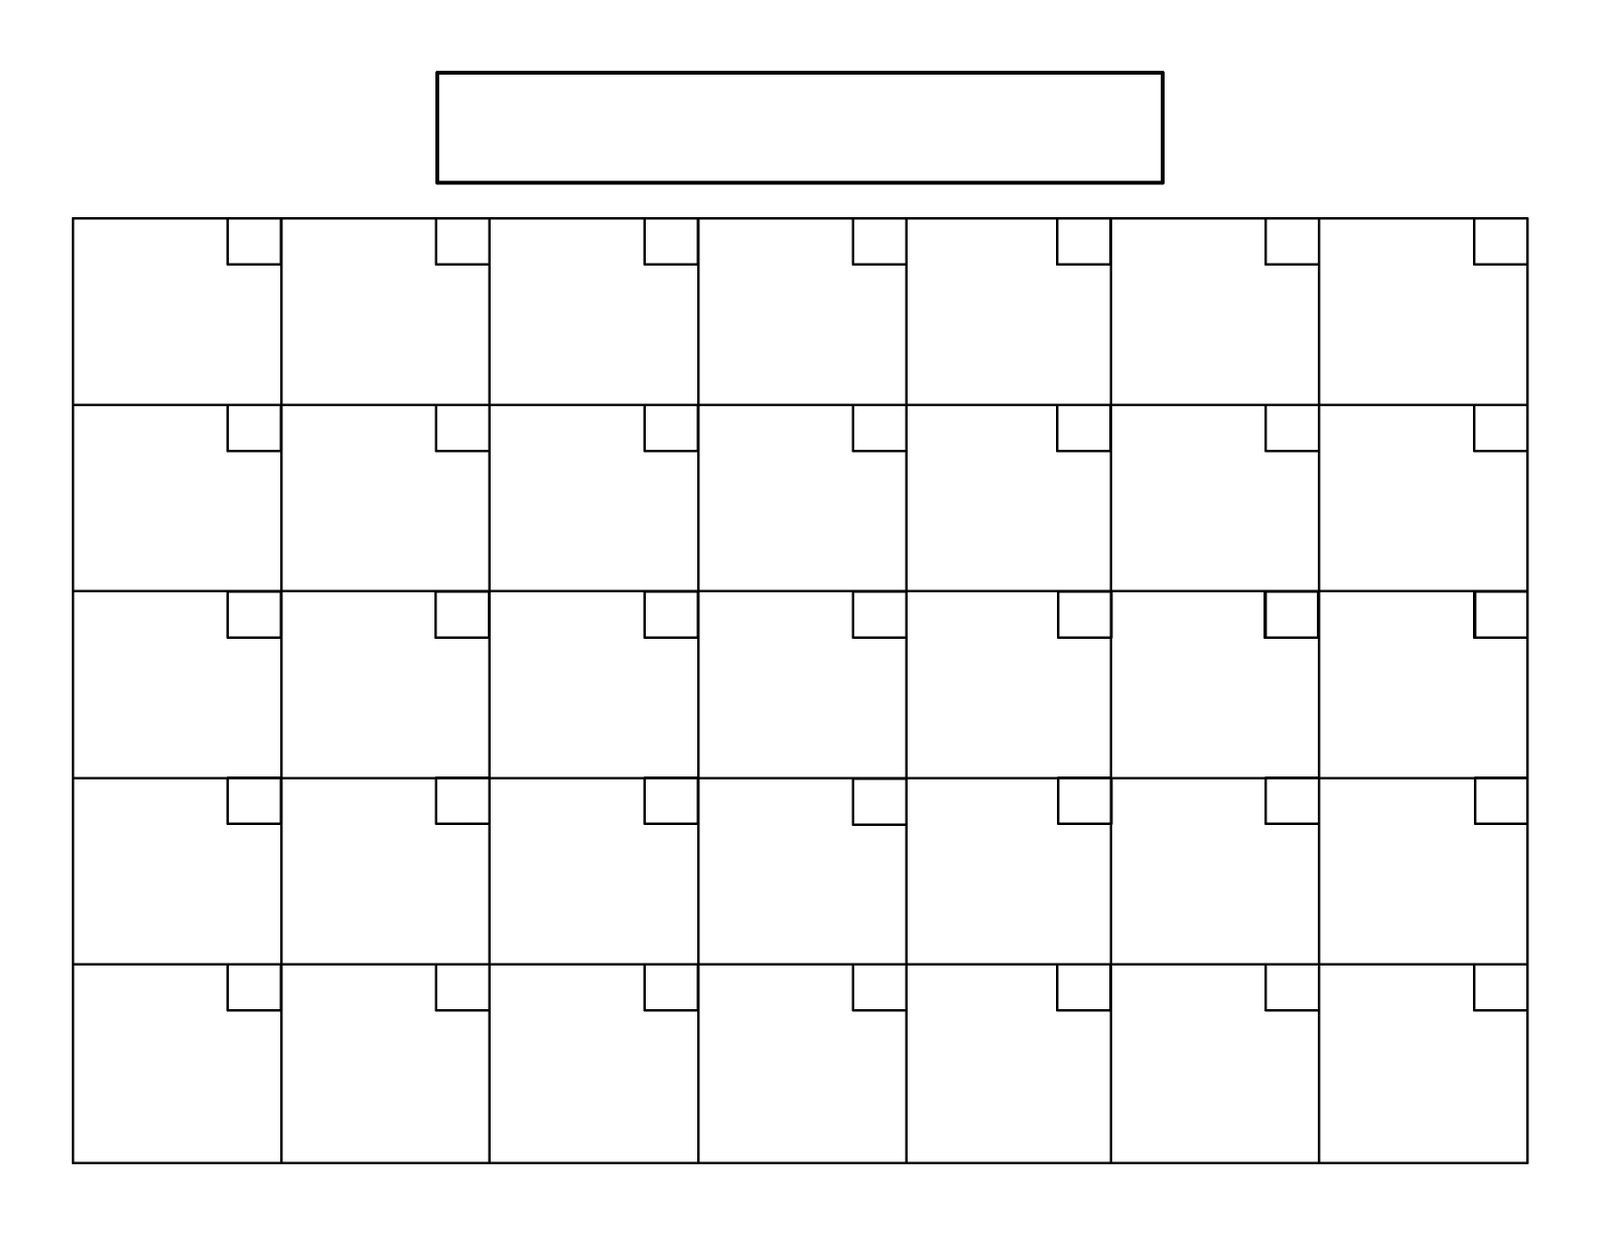 Blank Calendar Grid On 31 Day Calendar Template - Free Calendar for 31 Day Month Calendar Printable